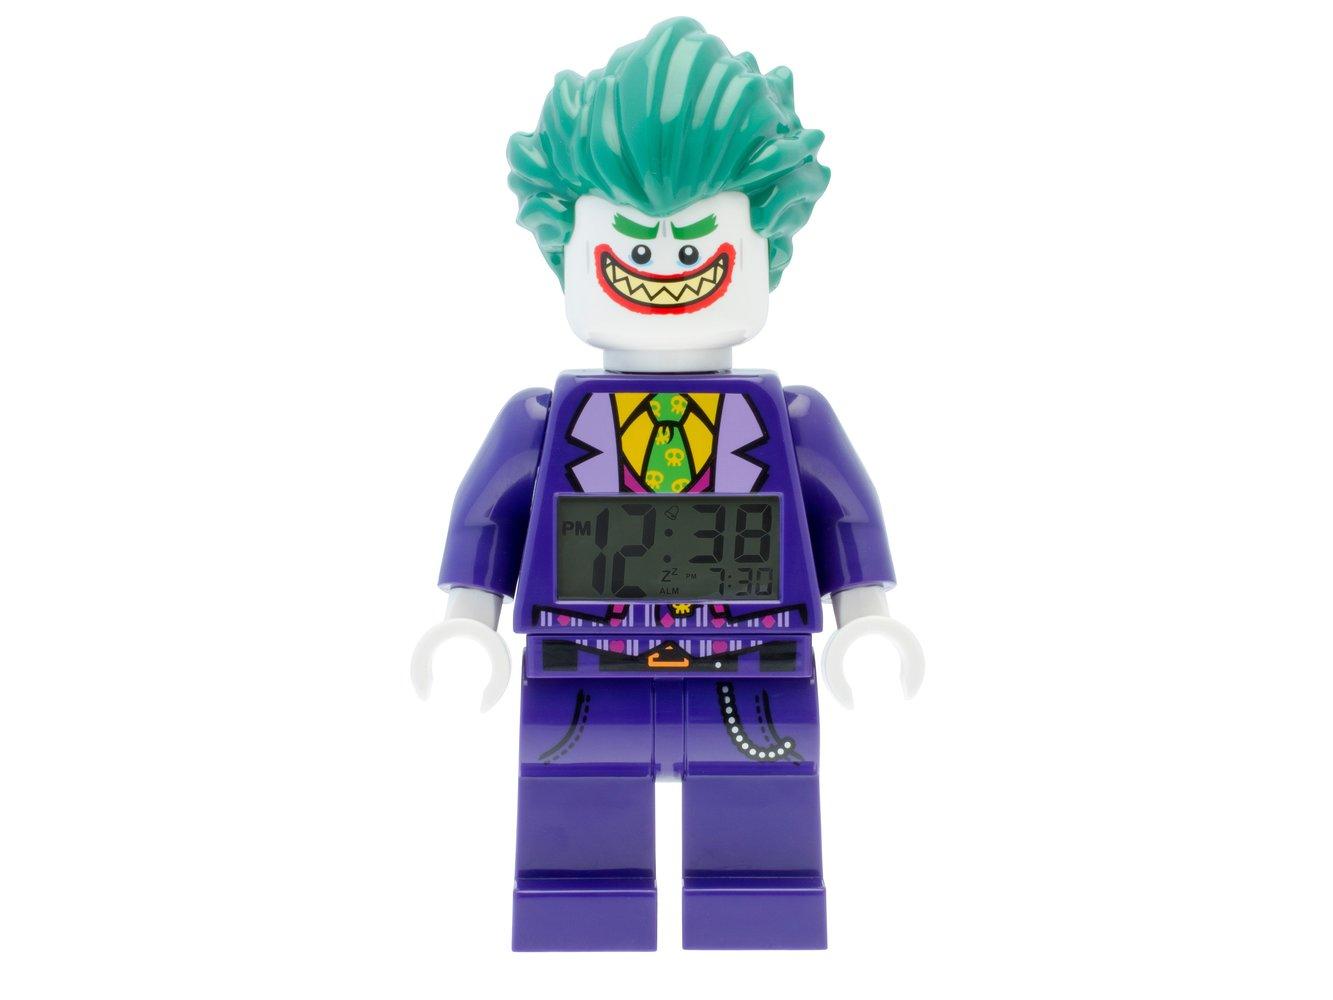 The Joker Alarm Clock